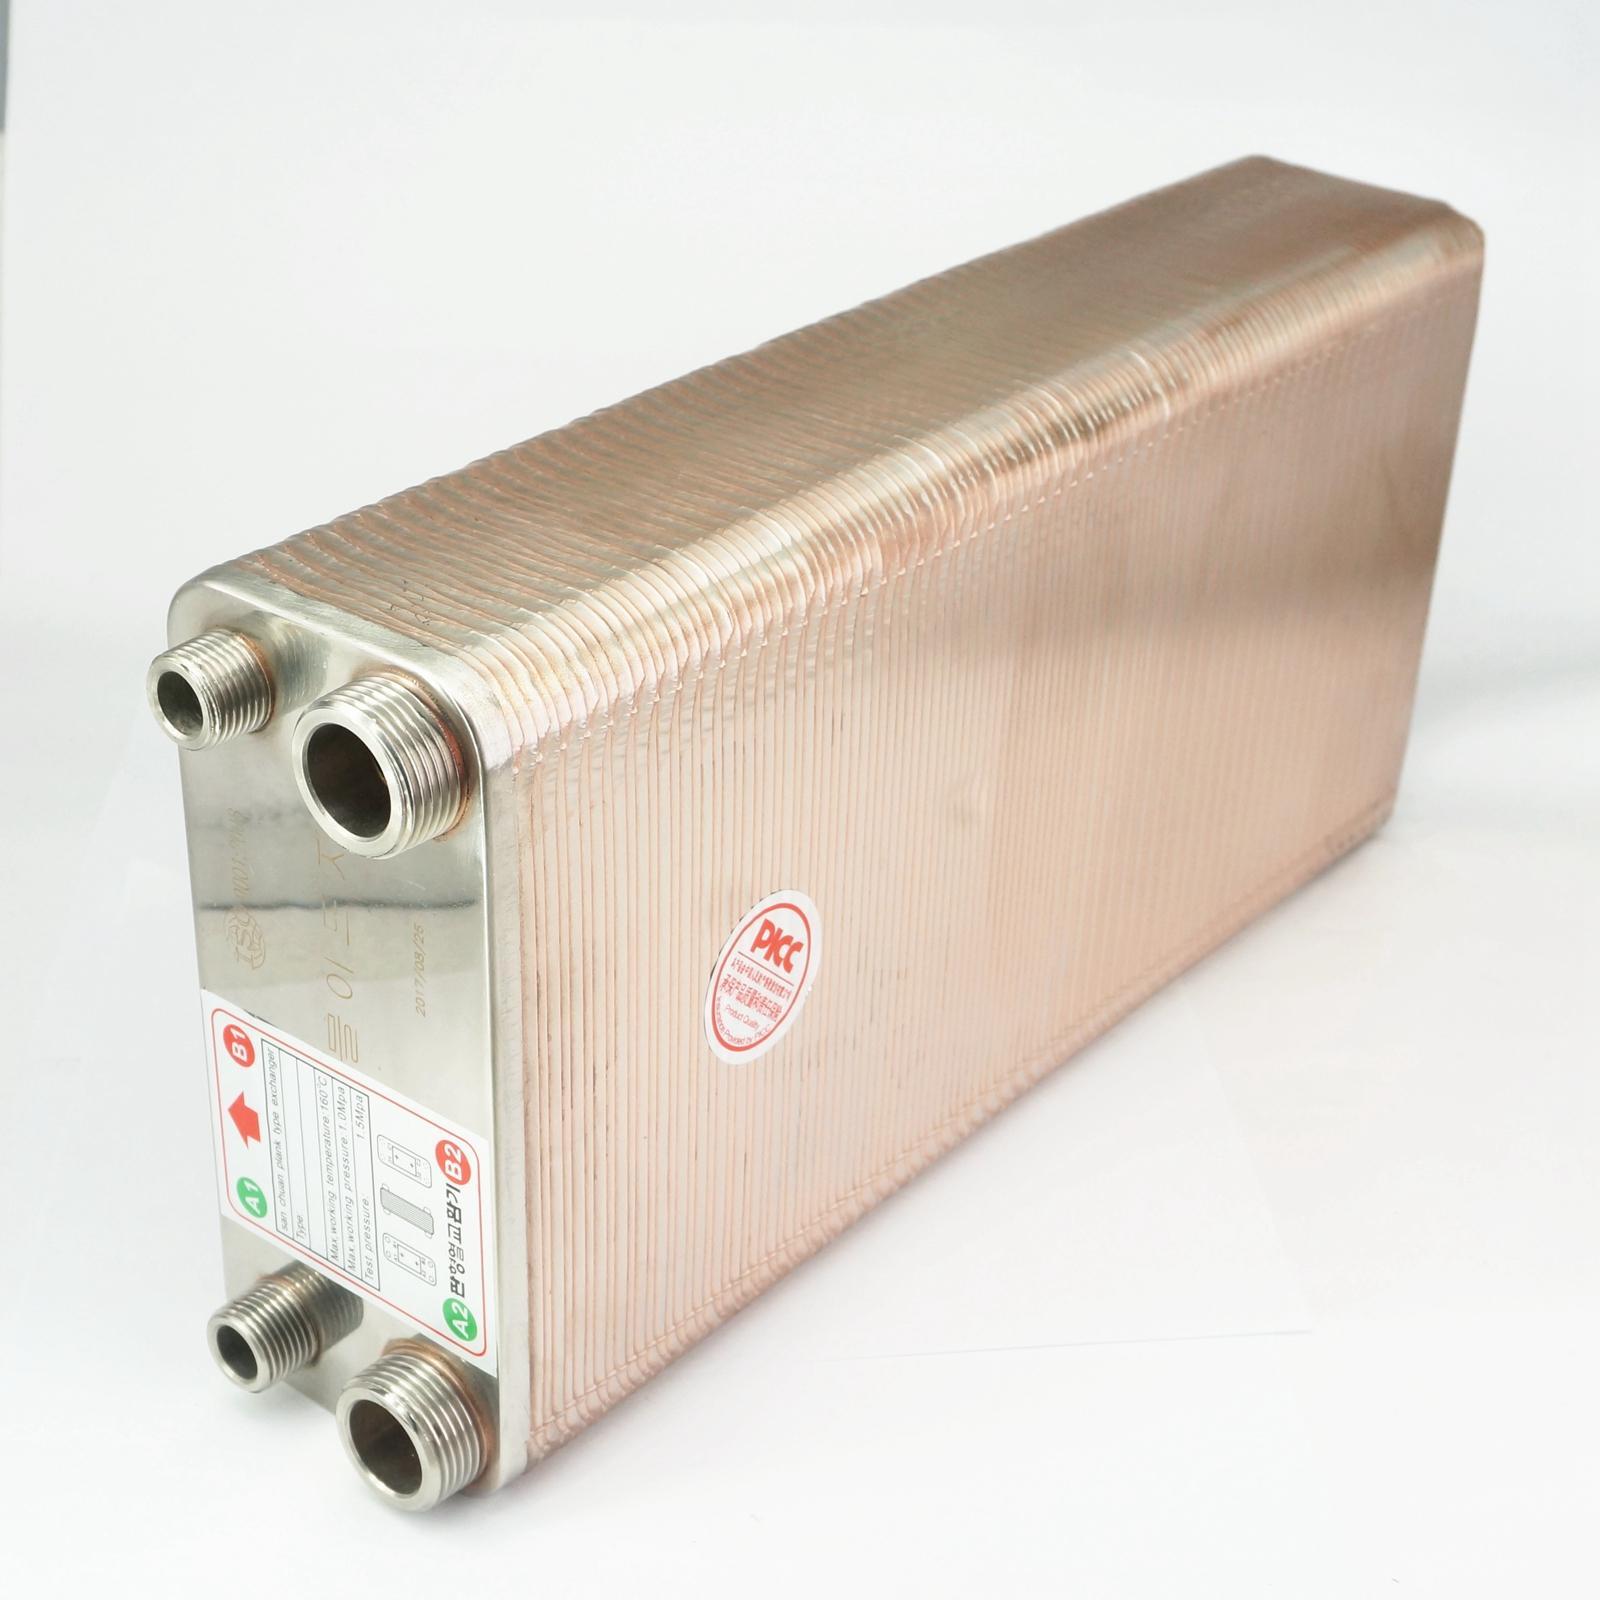 120 Plates Heat Exchanger Beer Wort Chiller Cooler 304 Stainless Steel For Home Brewing Beer